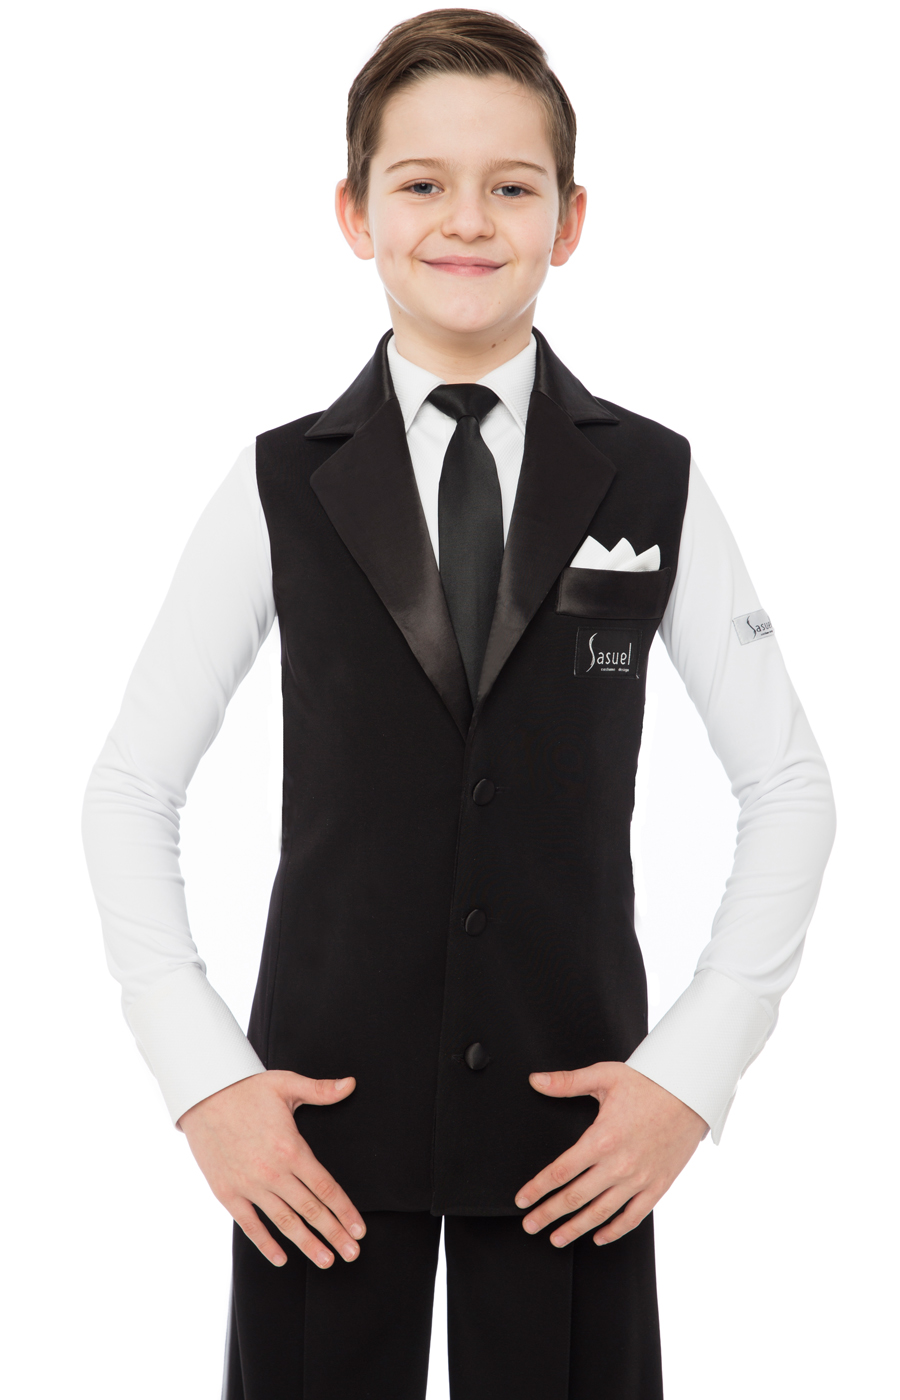 948b1dc70 Male Dress Code for Ballroom Dancing